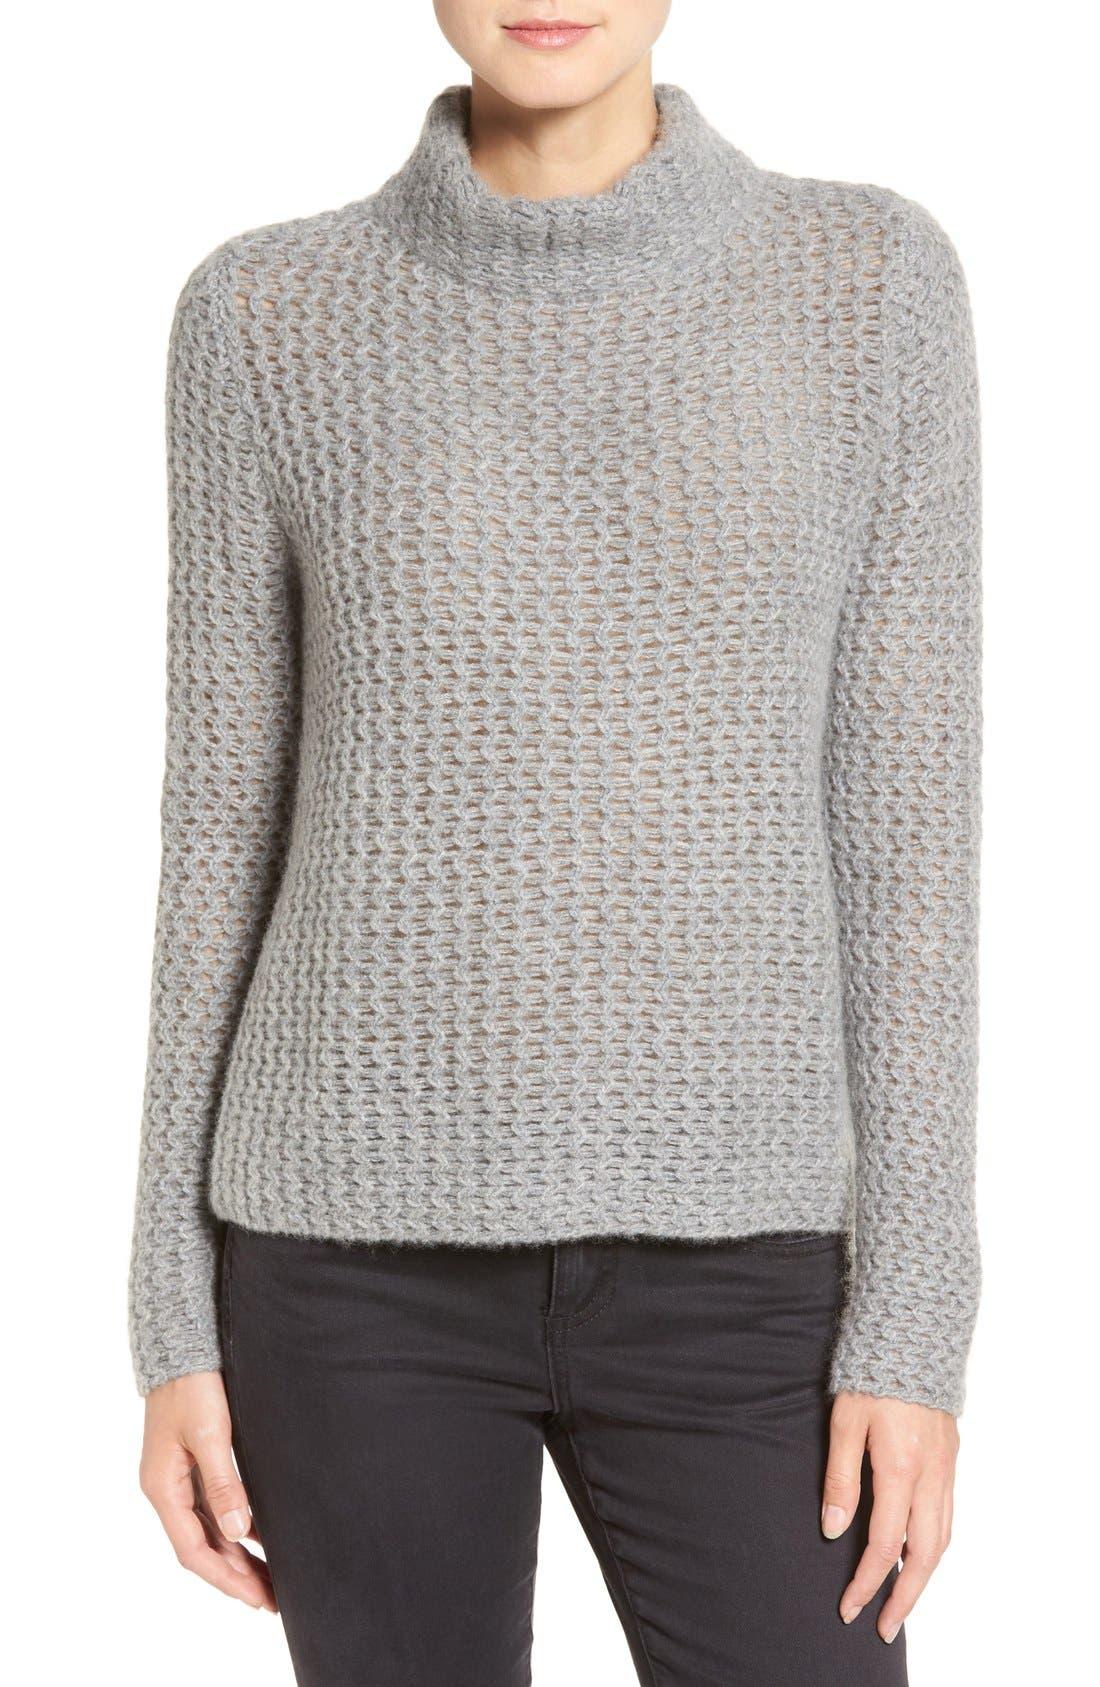 Stitch Detail Cashmere Mock Neck Sweater,                         Main,                         color, 030